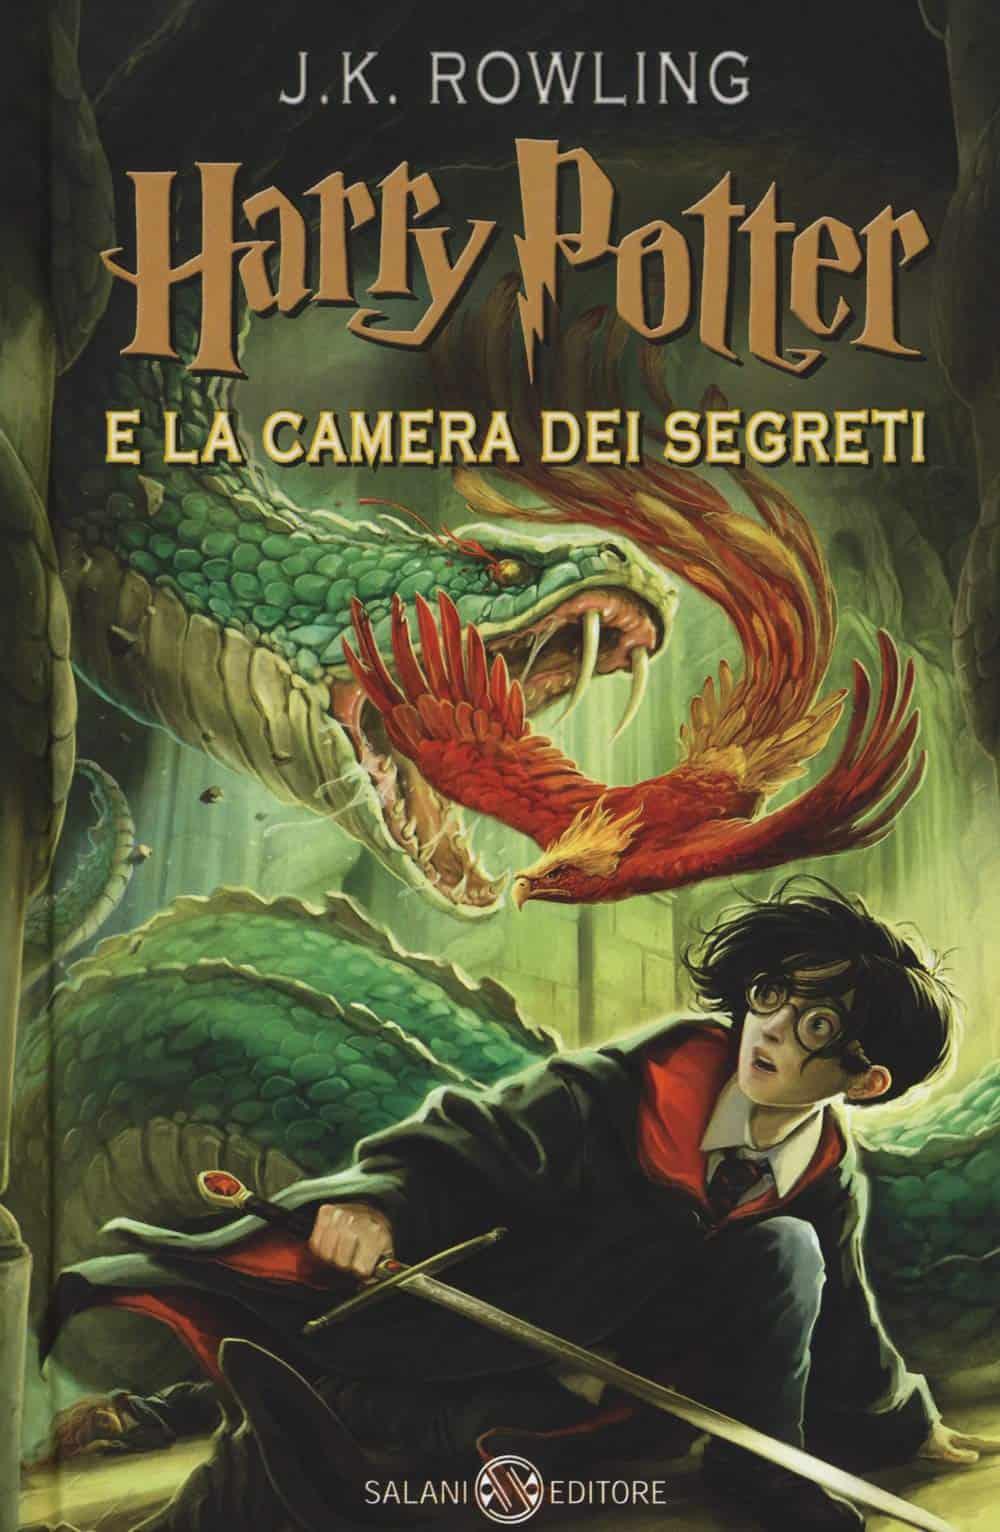 harry-potter-la-camera-dei-segreti--jonny-duddle